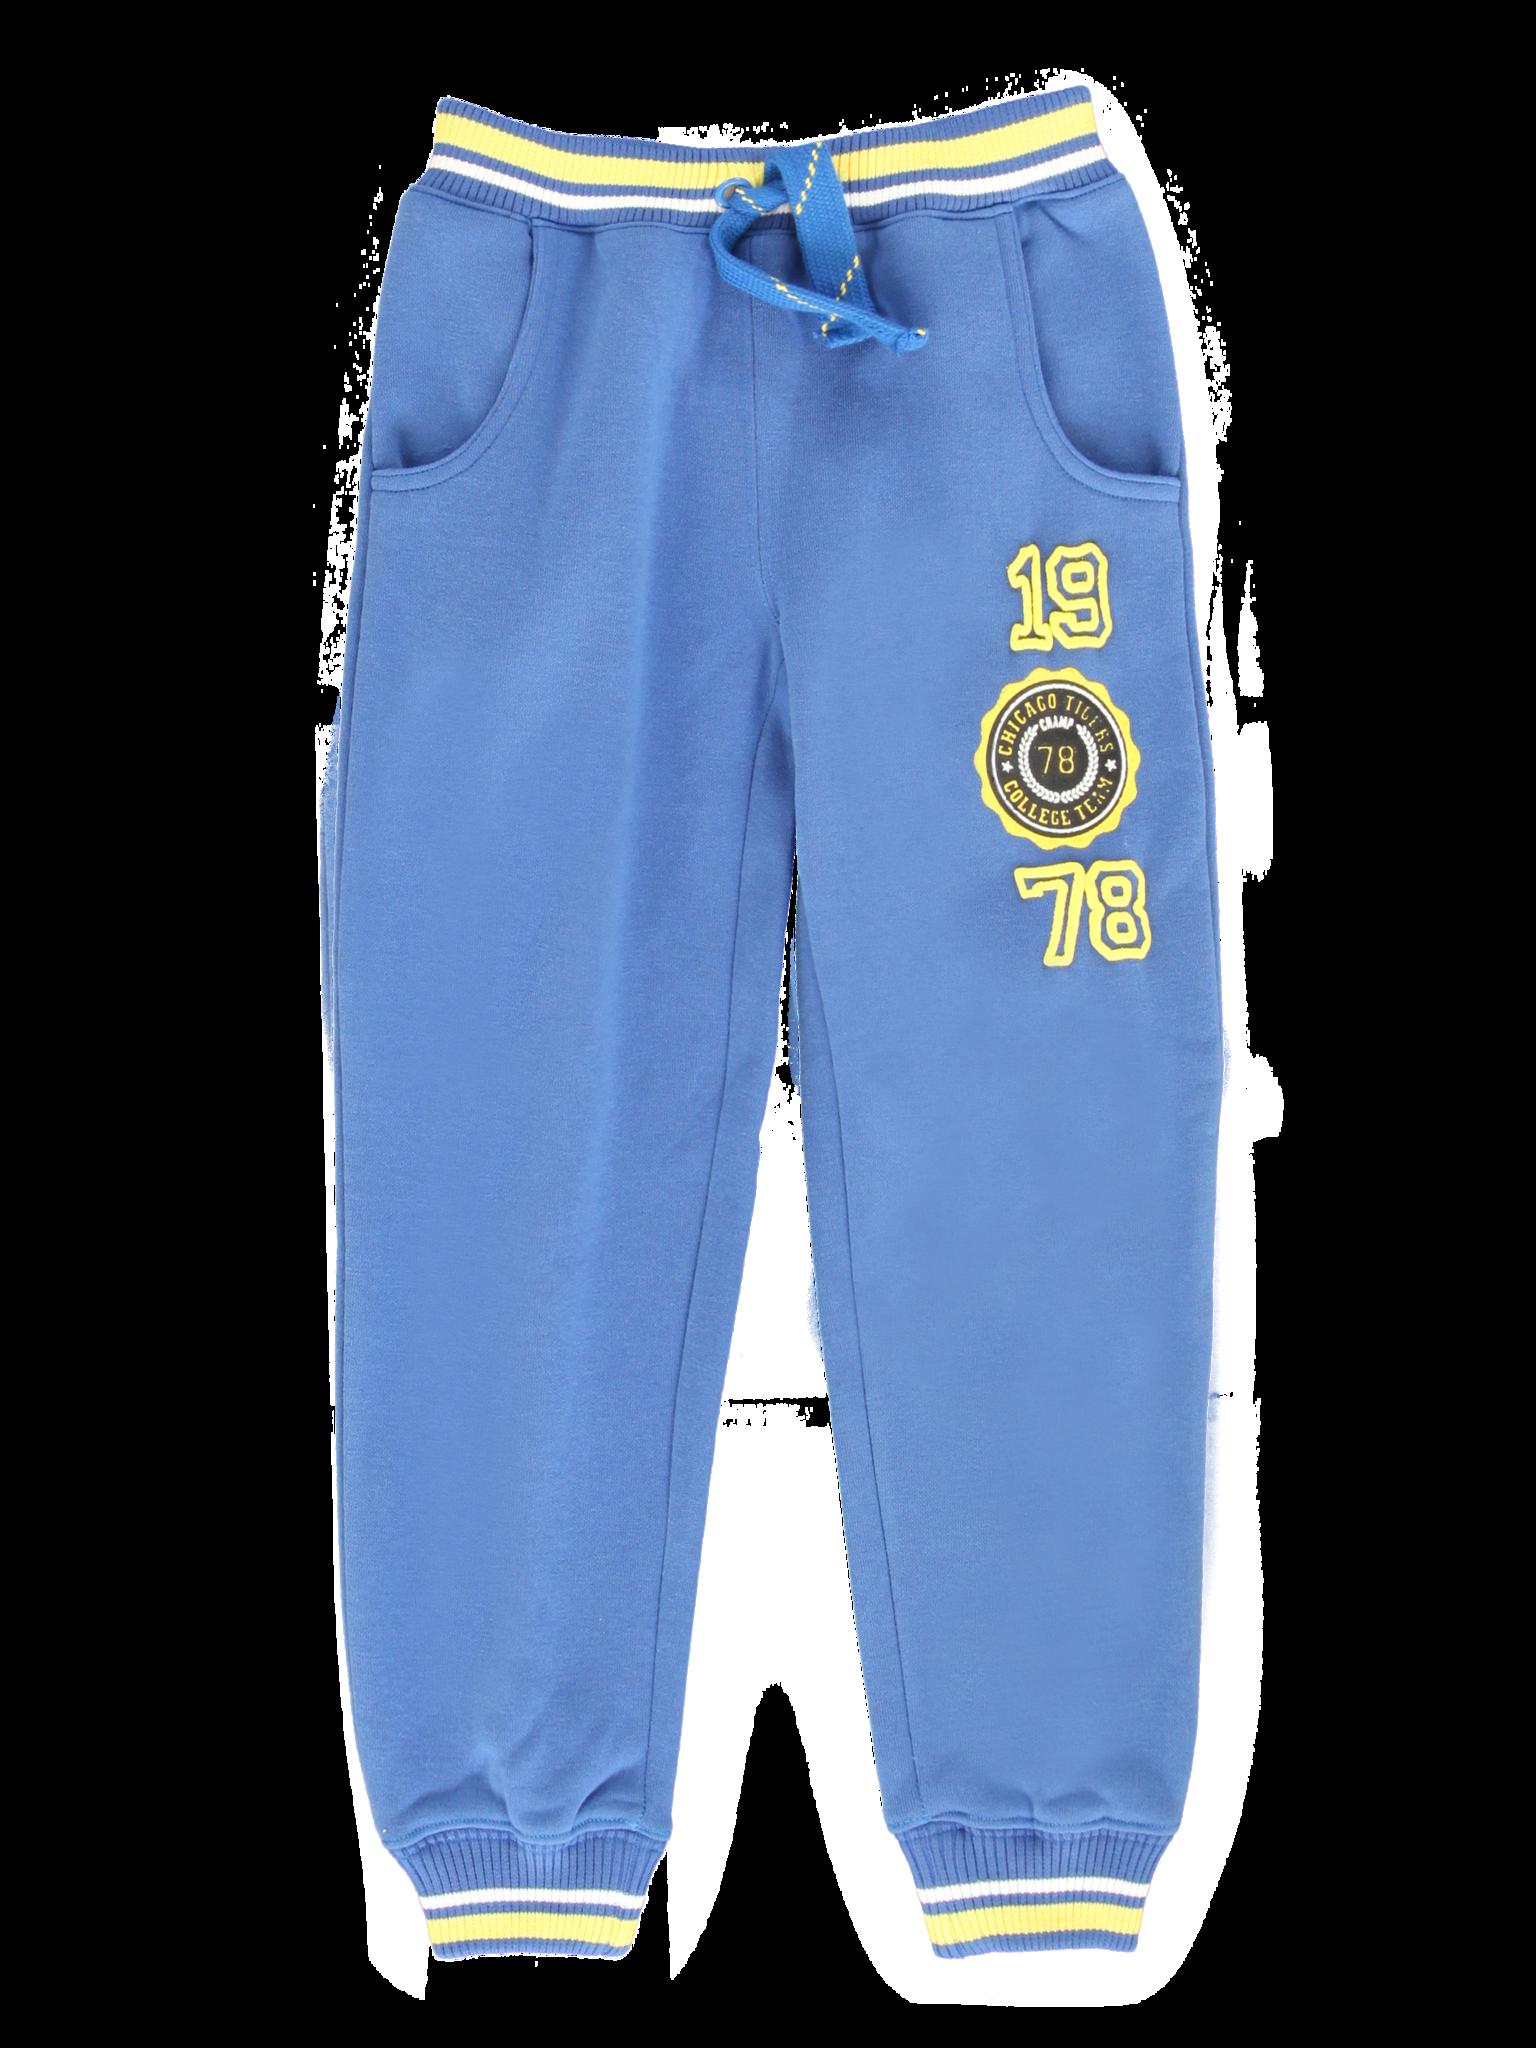 All Brands | Winterproducts Small Boys | Jogging Pant | 10 pcs/box